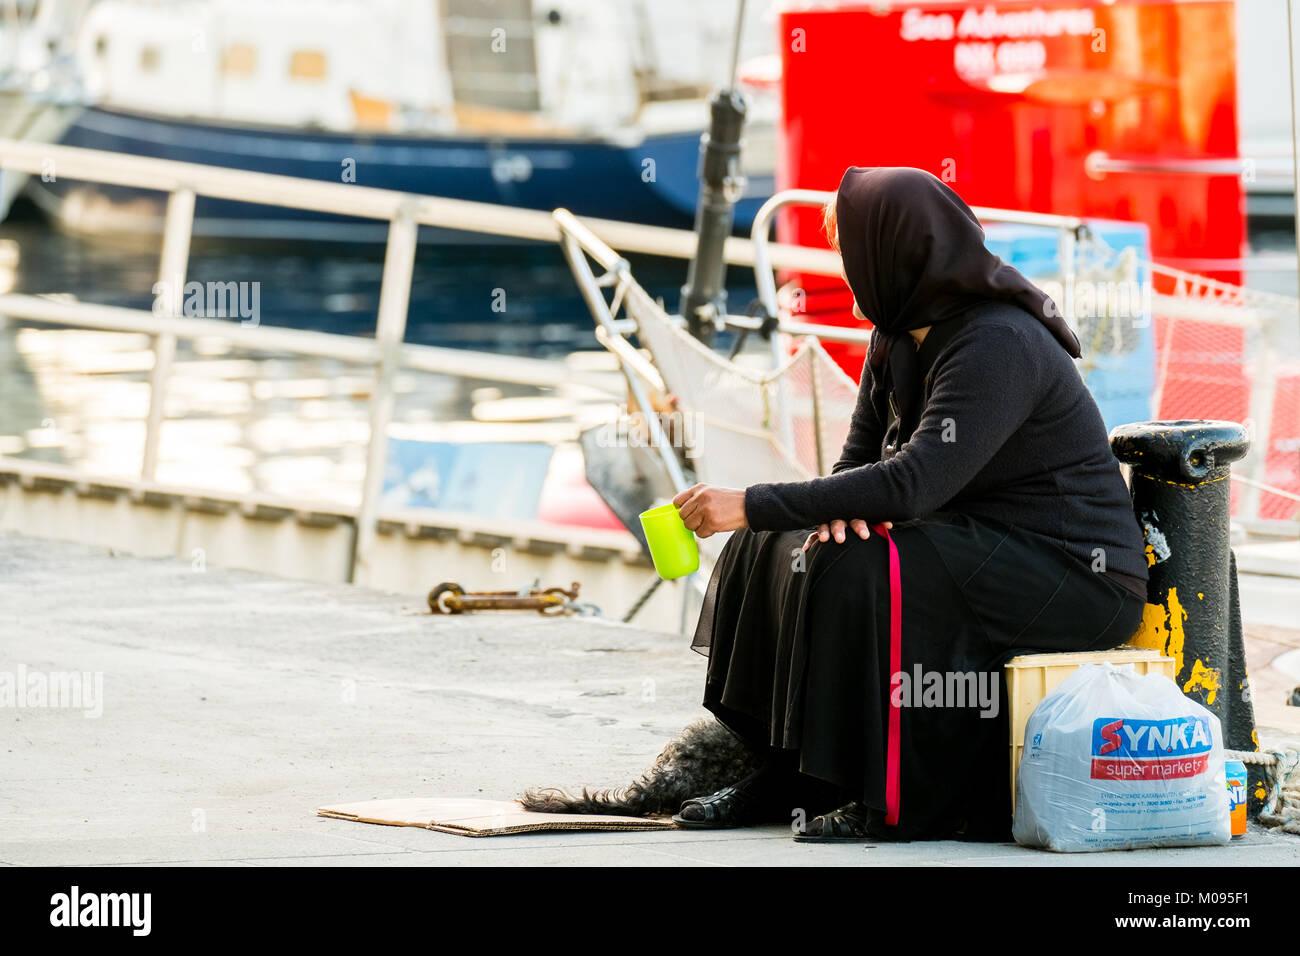 beggar woman in black robe in port of Chania, poverty, Europe, Crete, Greece, Chania, Europe, Crete, Greece, GR, - Stock Image